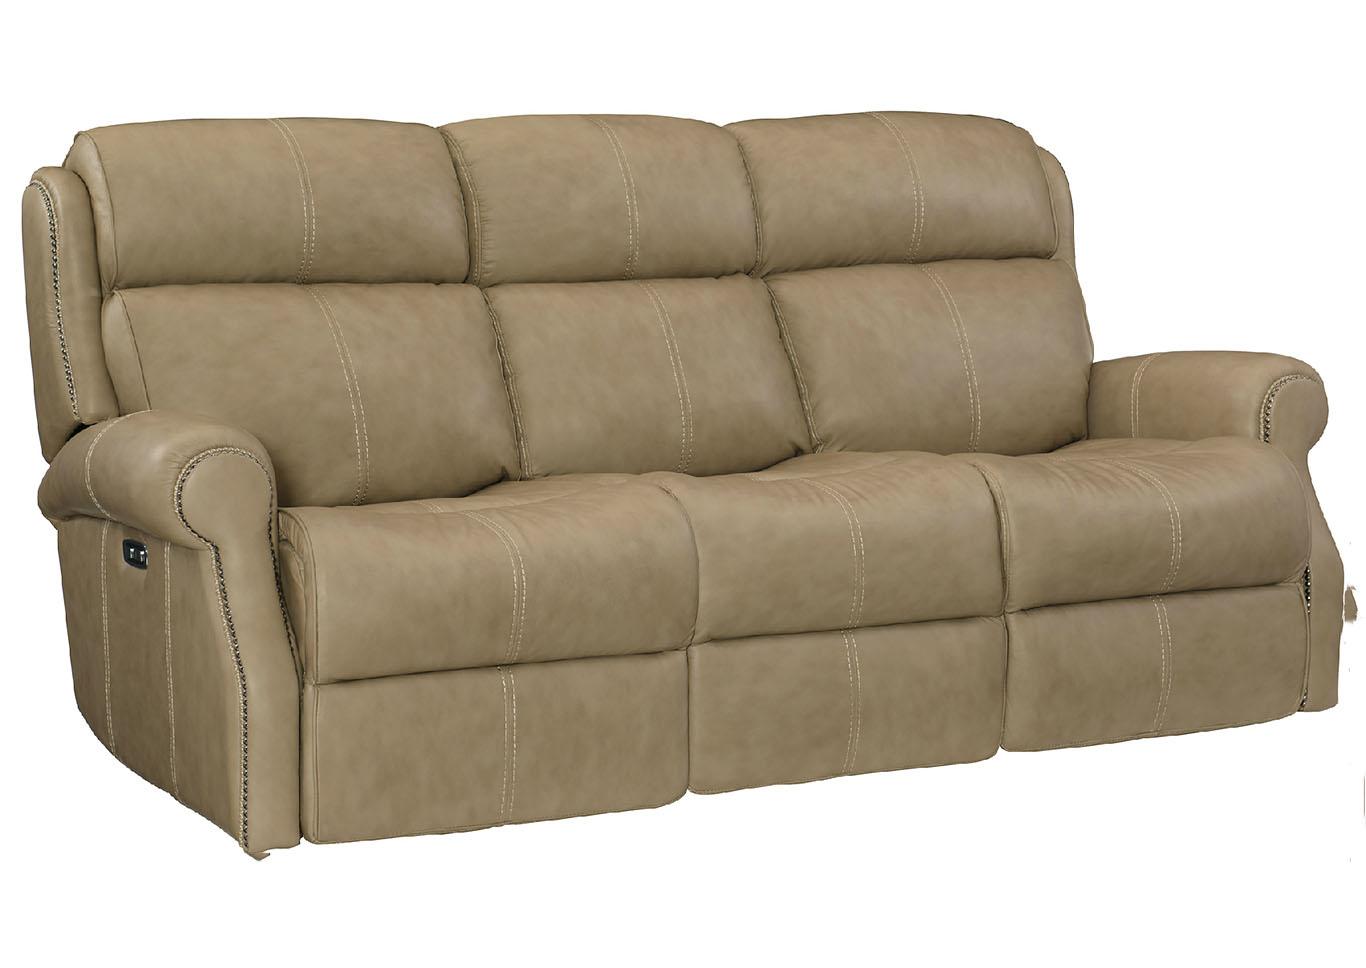 Pleasing Ivan Smith Mcgwire Malt Power Reclining Sofa Short Links Chair Design For Home Short Linksinfo